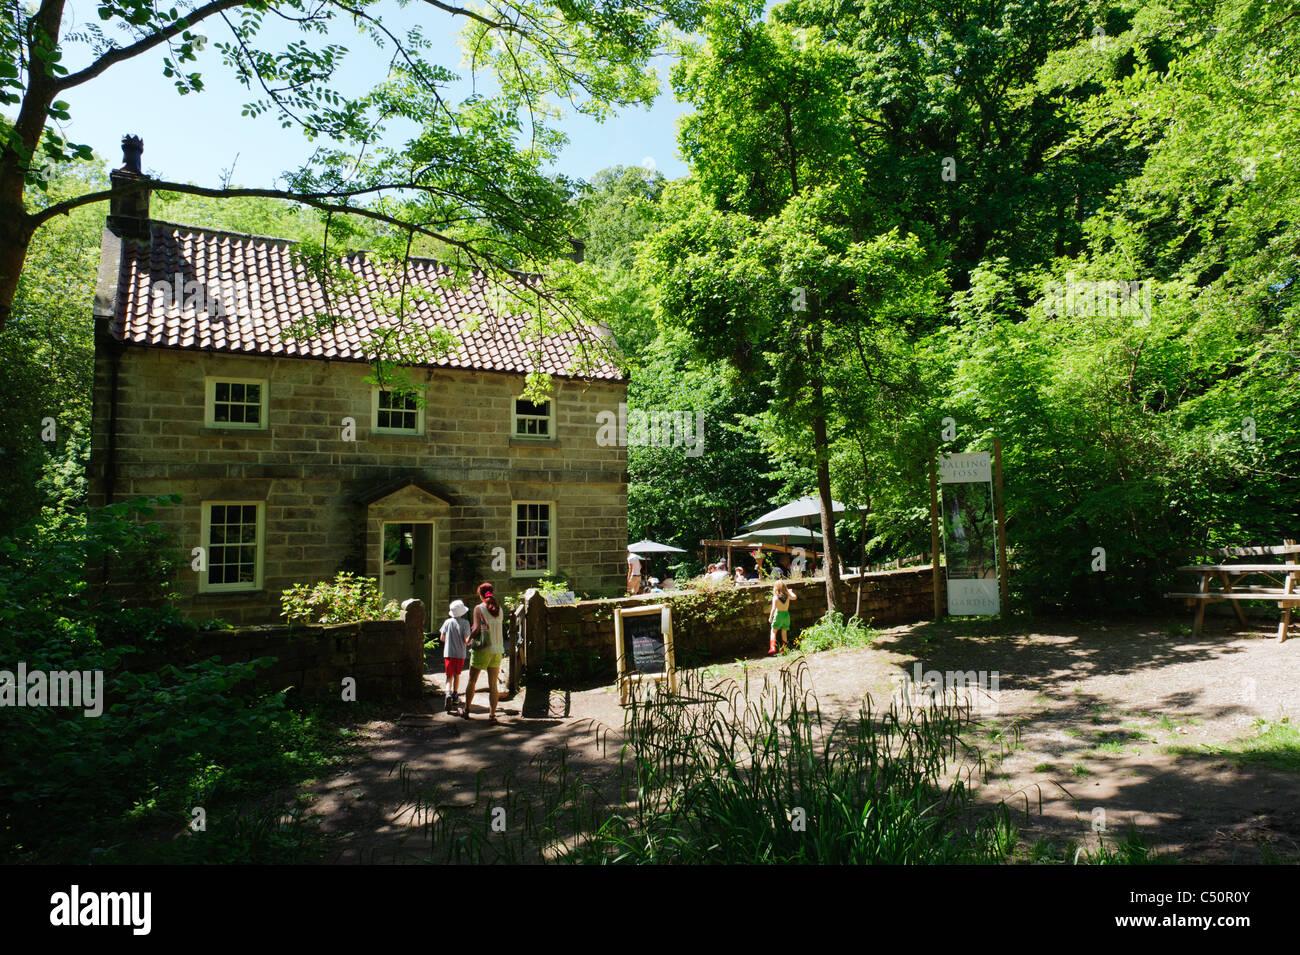 Falling Foss Tea Garden, Sneaton Forest - Stock Image